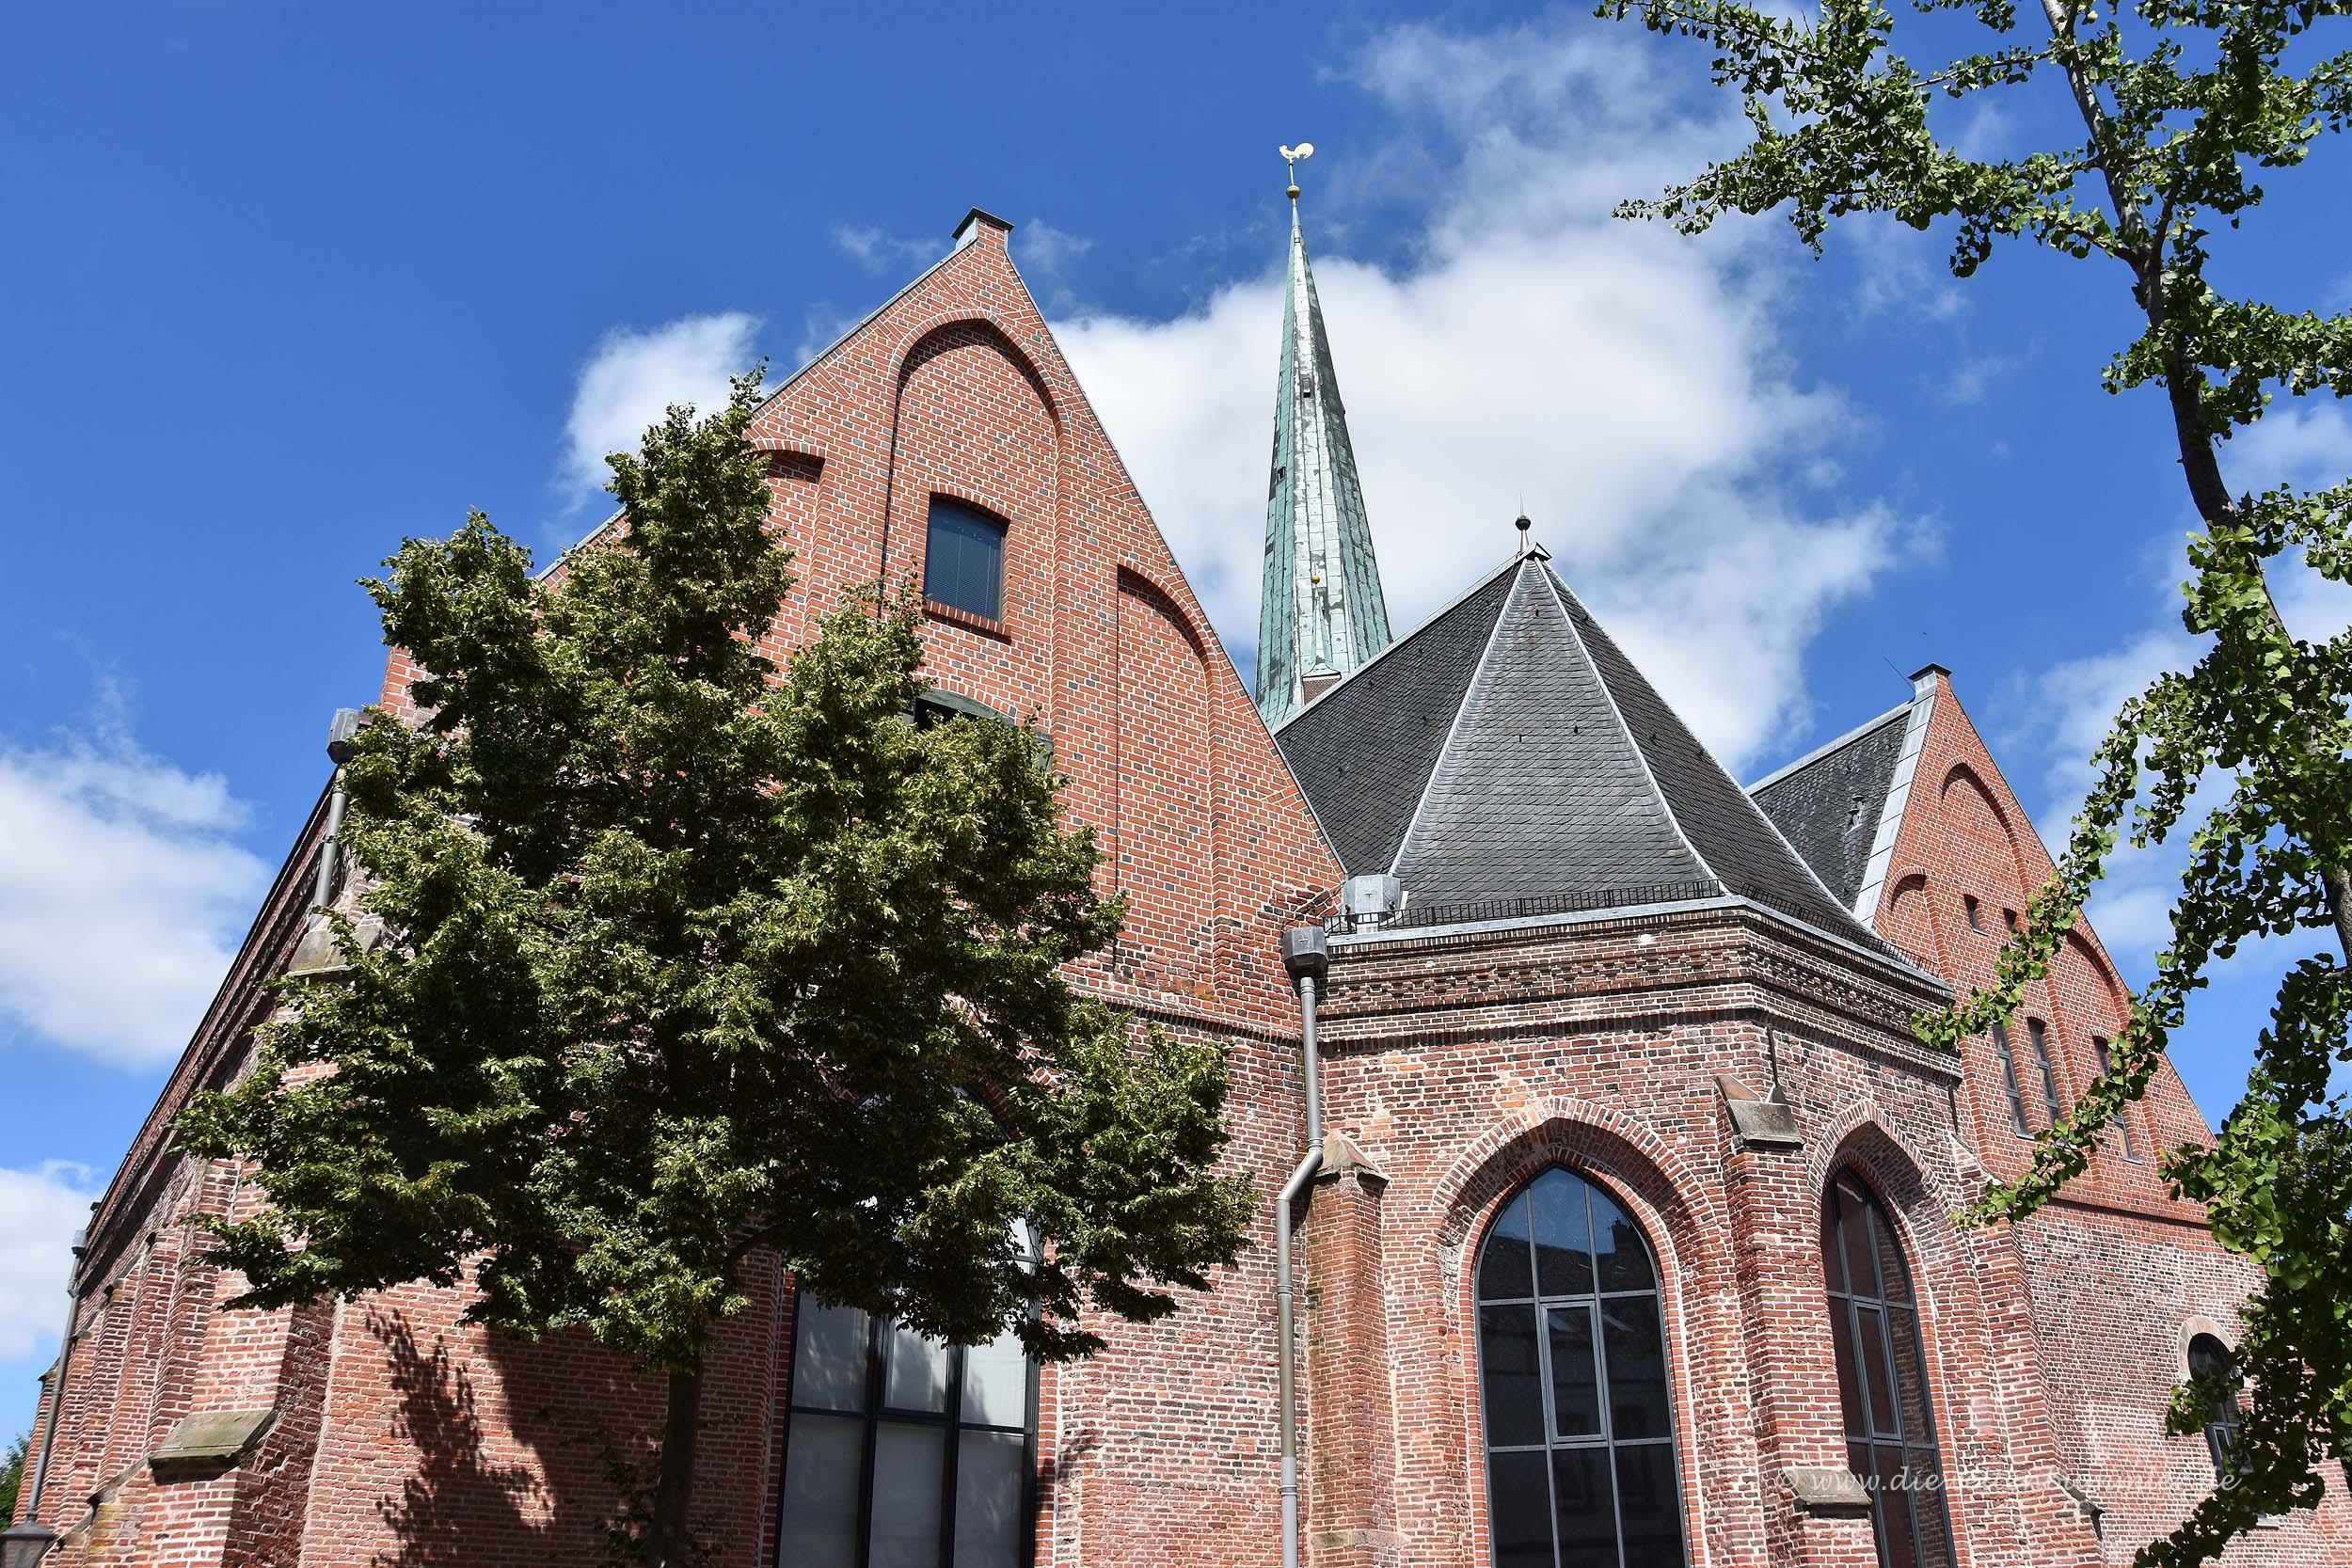 Ehemalige Kirche in Emden